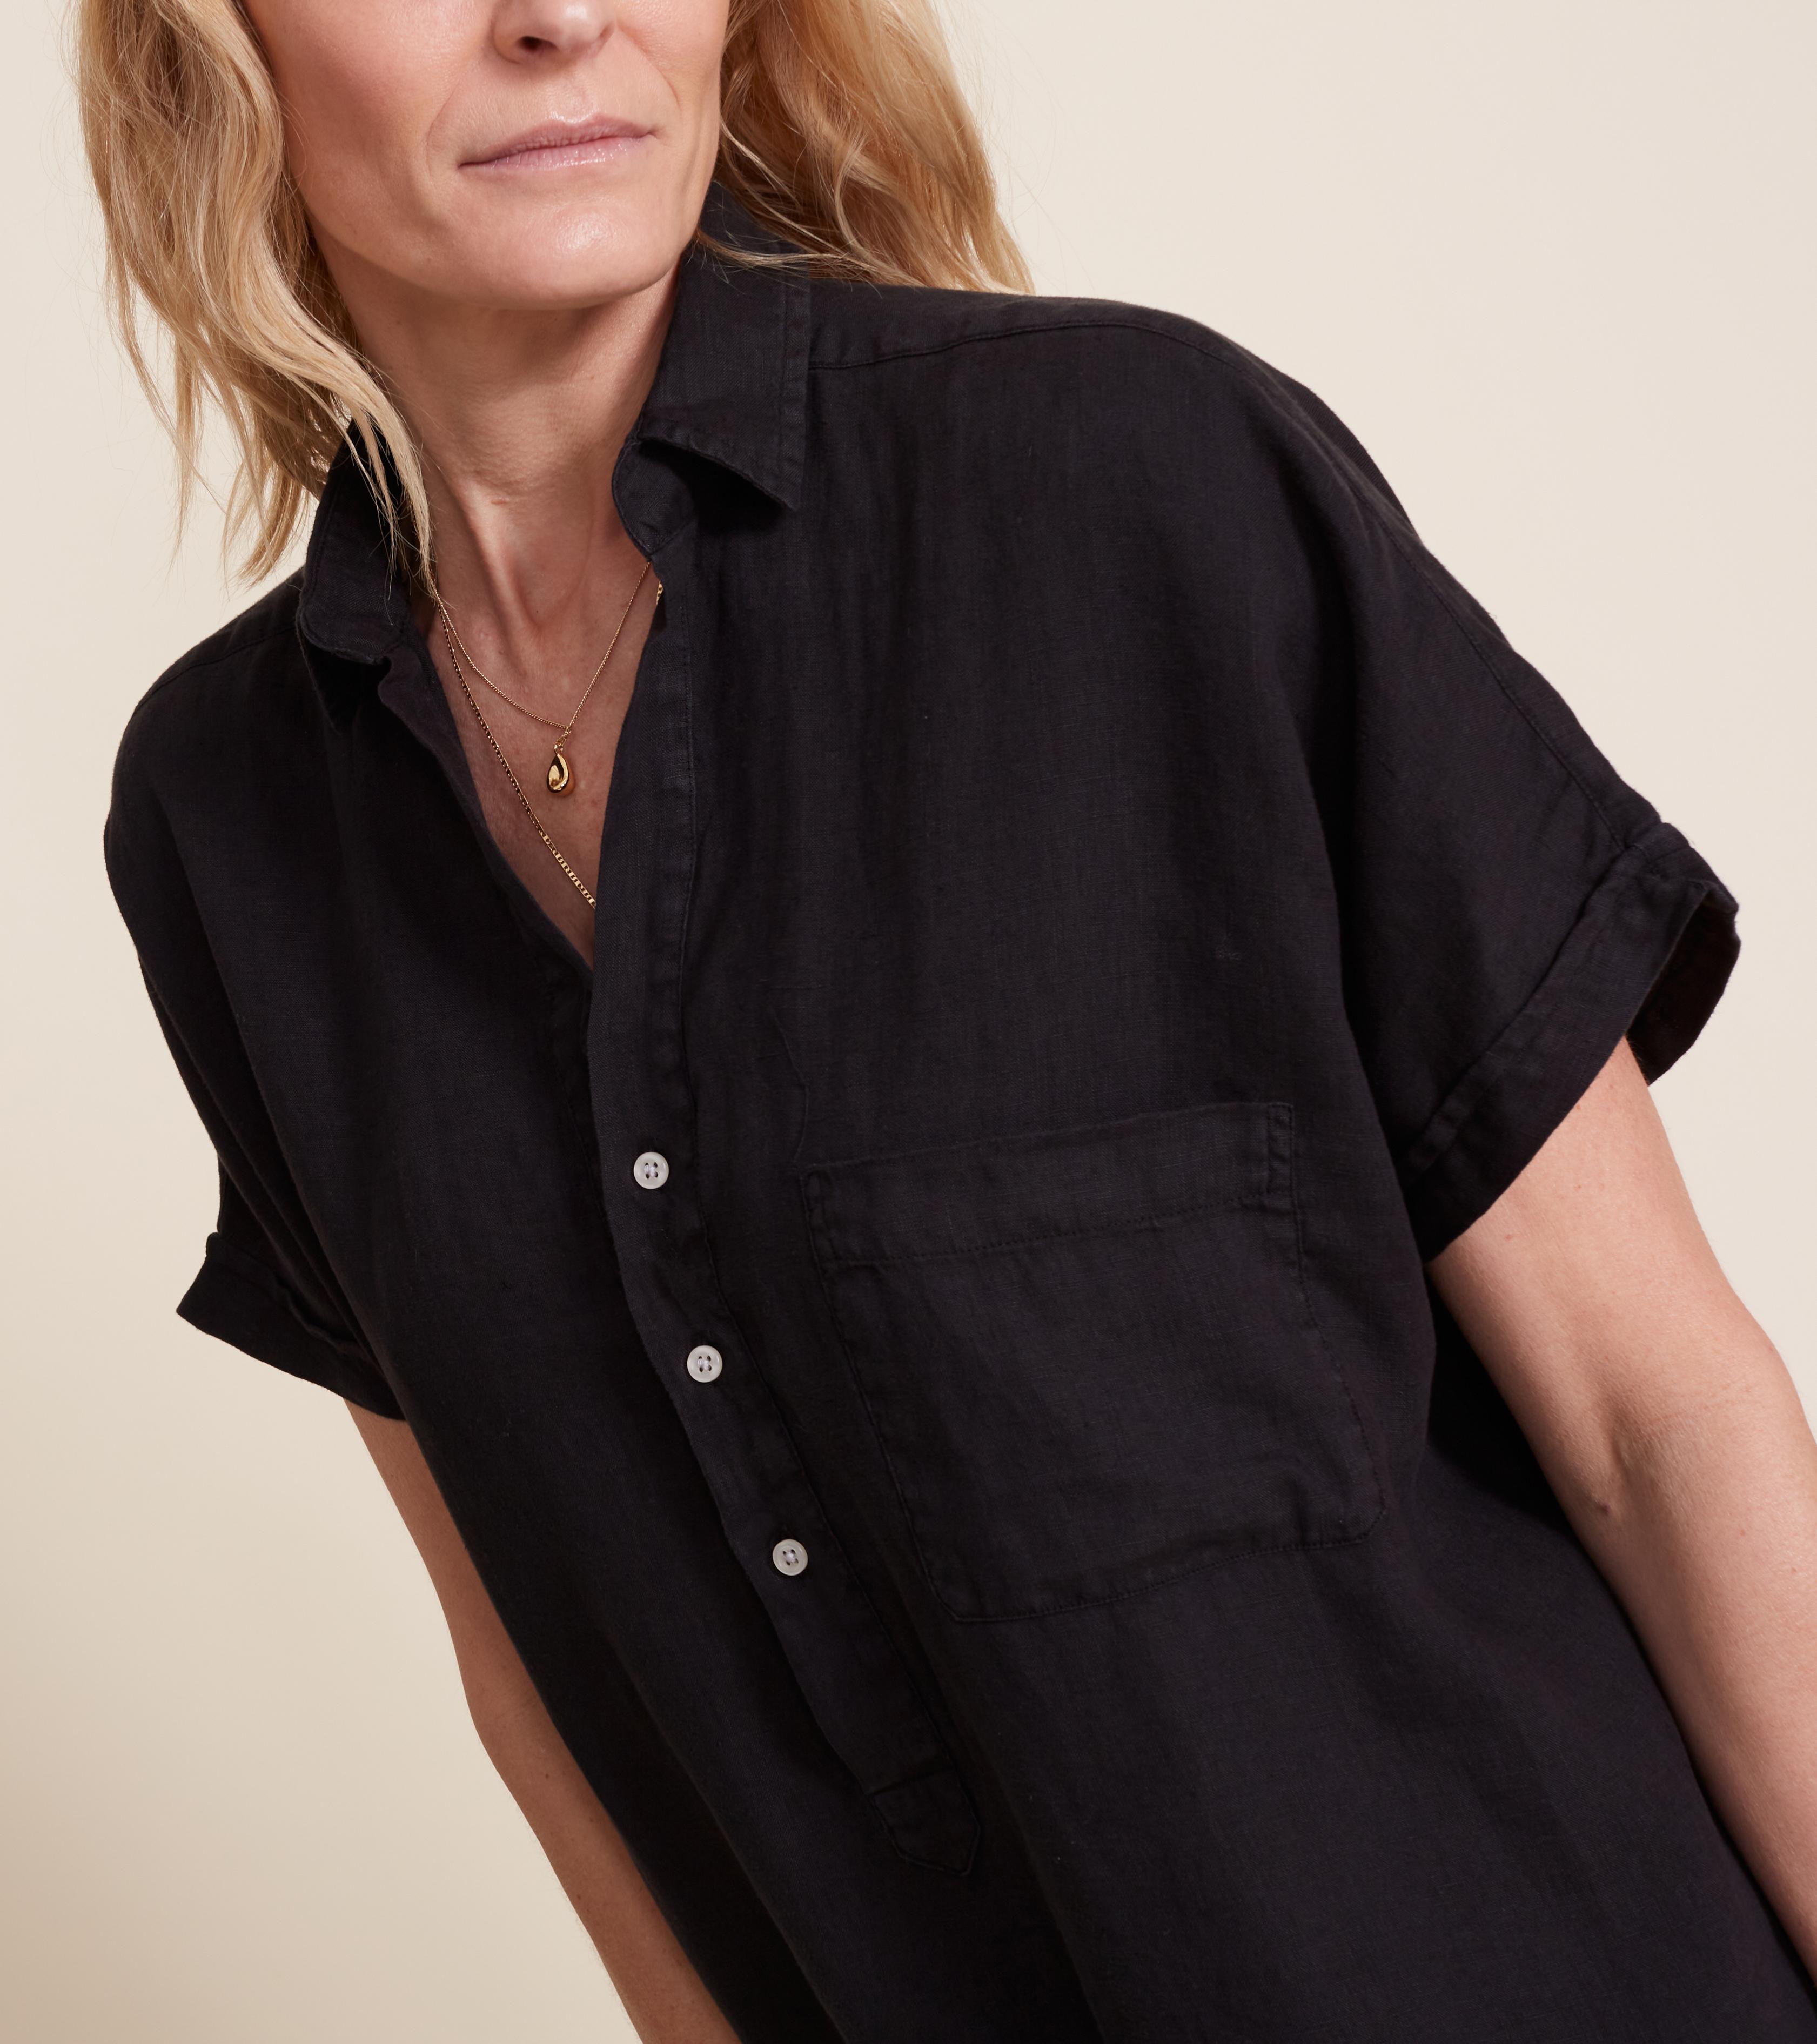 Image of The Artist Short Sleeve Dress Black, Tumbled Linen